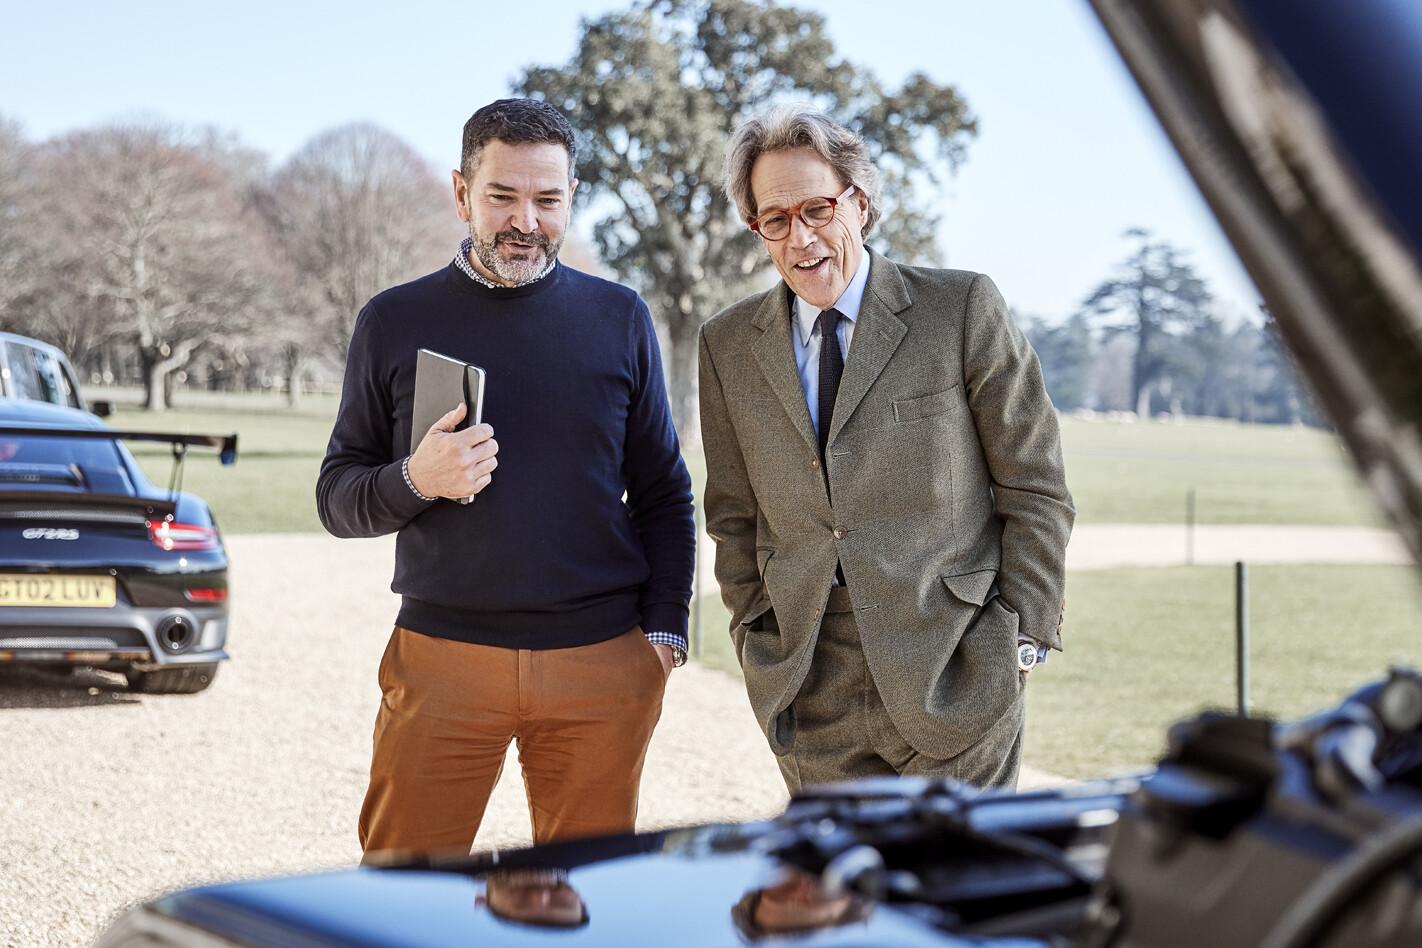 Goodwood Porsche and Land Rover